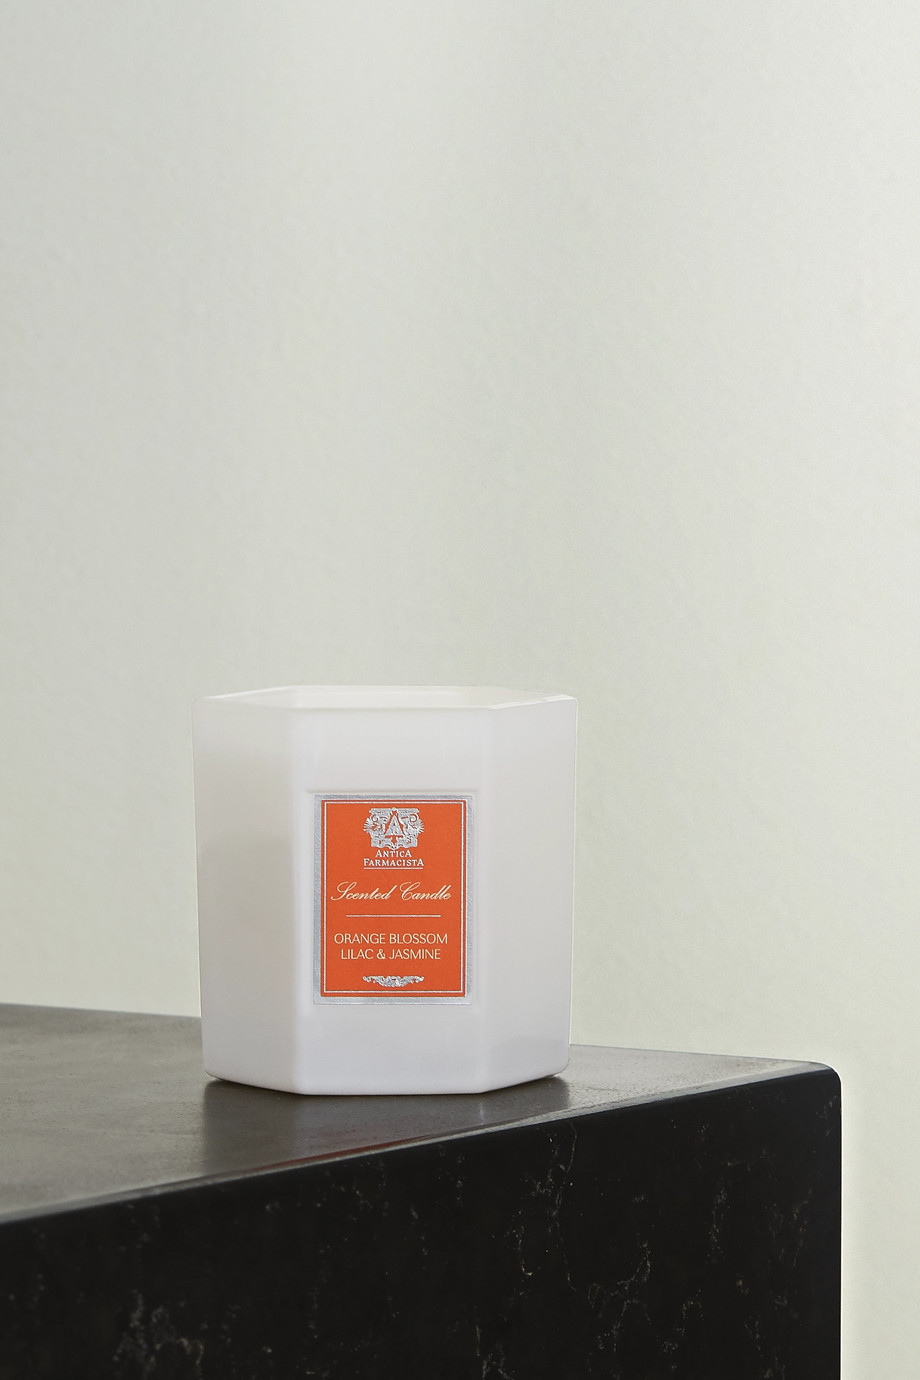 Antica Farmacista Orange Blossom, Lilac & Jasmine scented candle, 255g